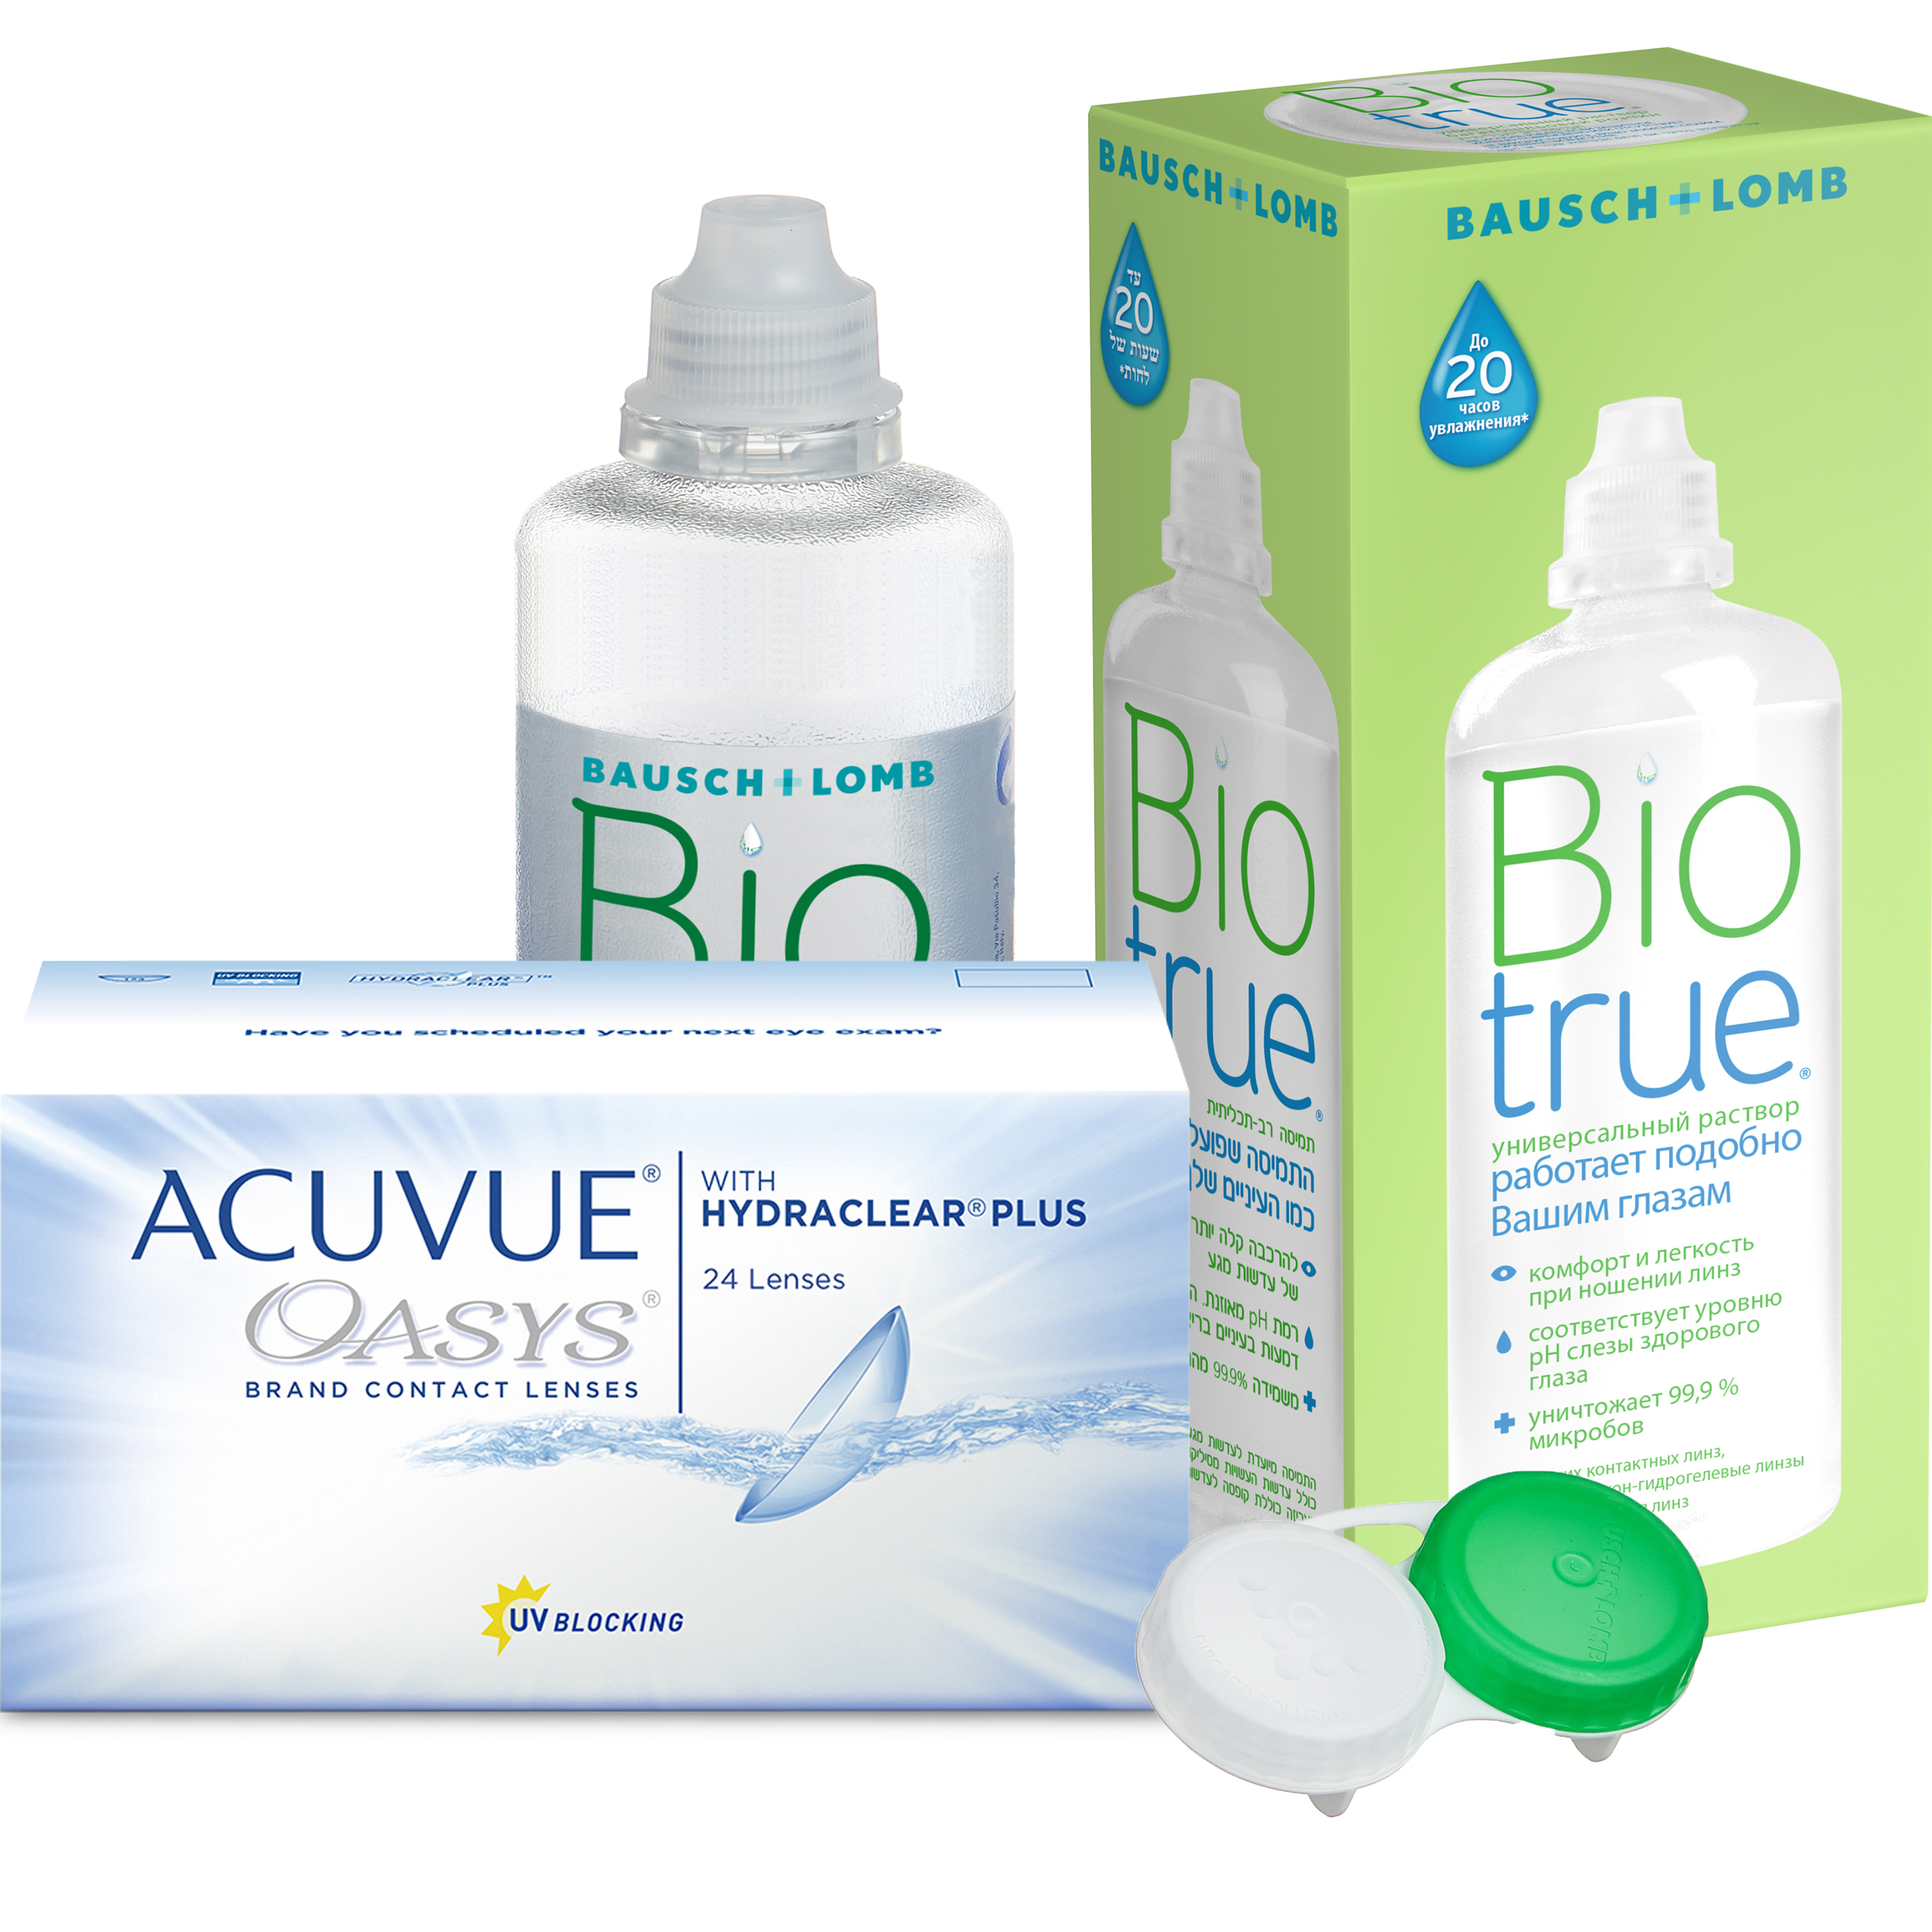 Купить Oasys with Hydraclear Plus 24 линзы + Biotrue, Контактные линзы Acuvue Oasys with Hydraclear Plus 24 линзы R 8.8 -4, 75 + Biotrue 300 мл